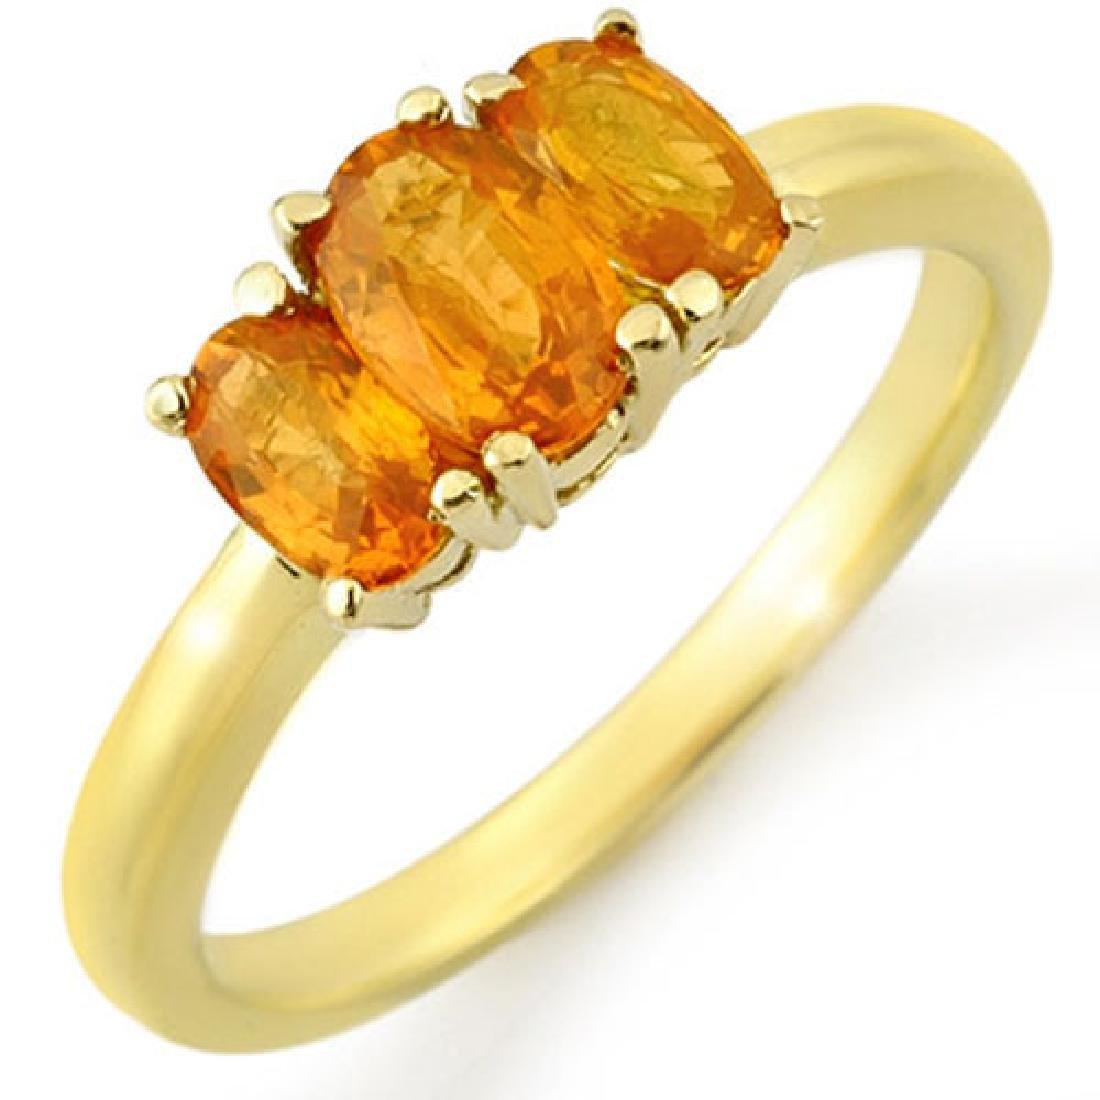 1.18 CTW Orange Sapphire Ring 10K Yellow Gold